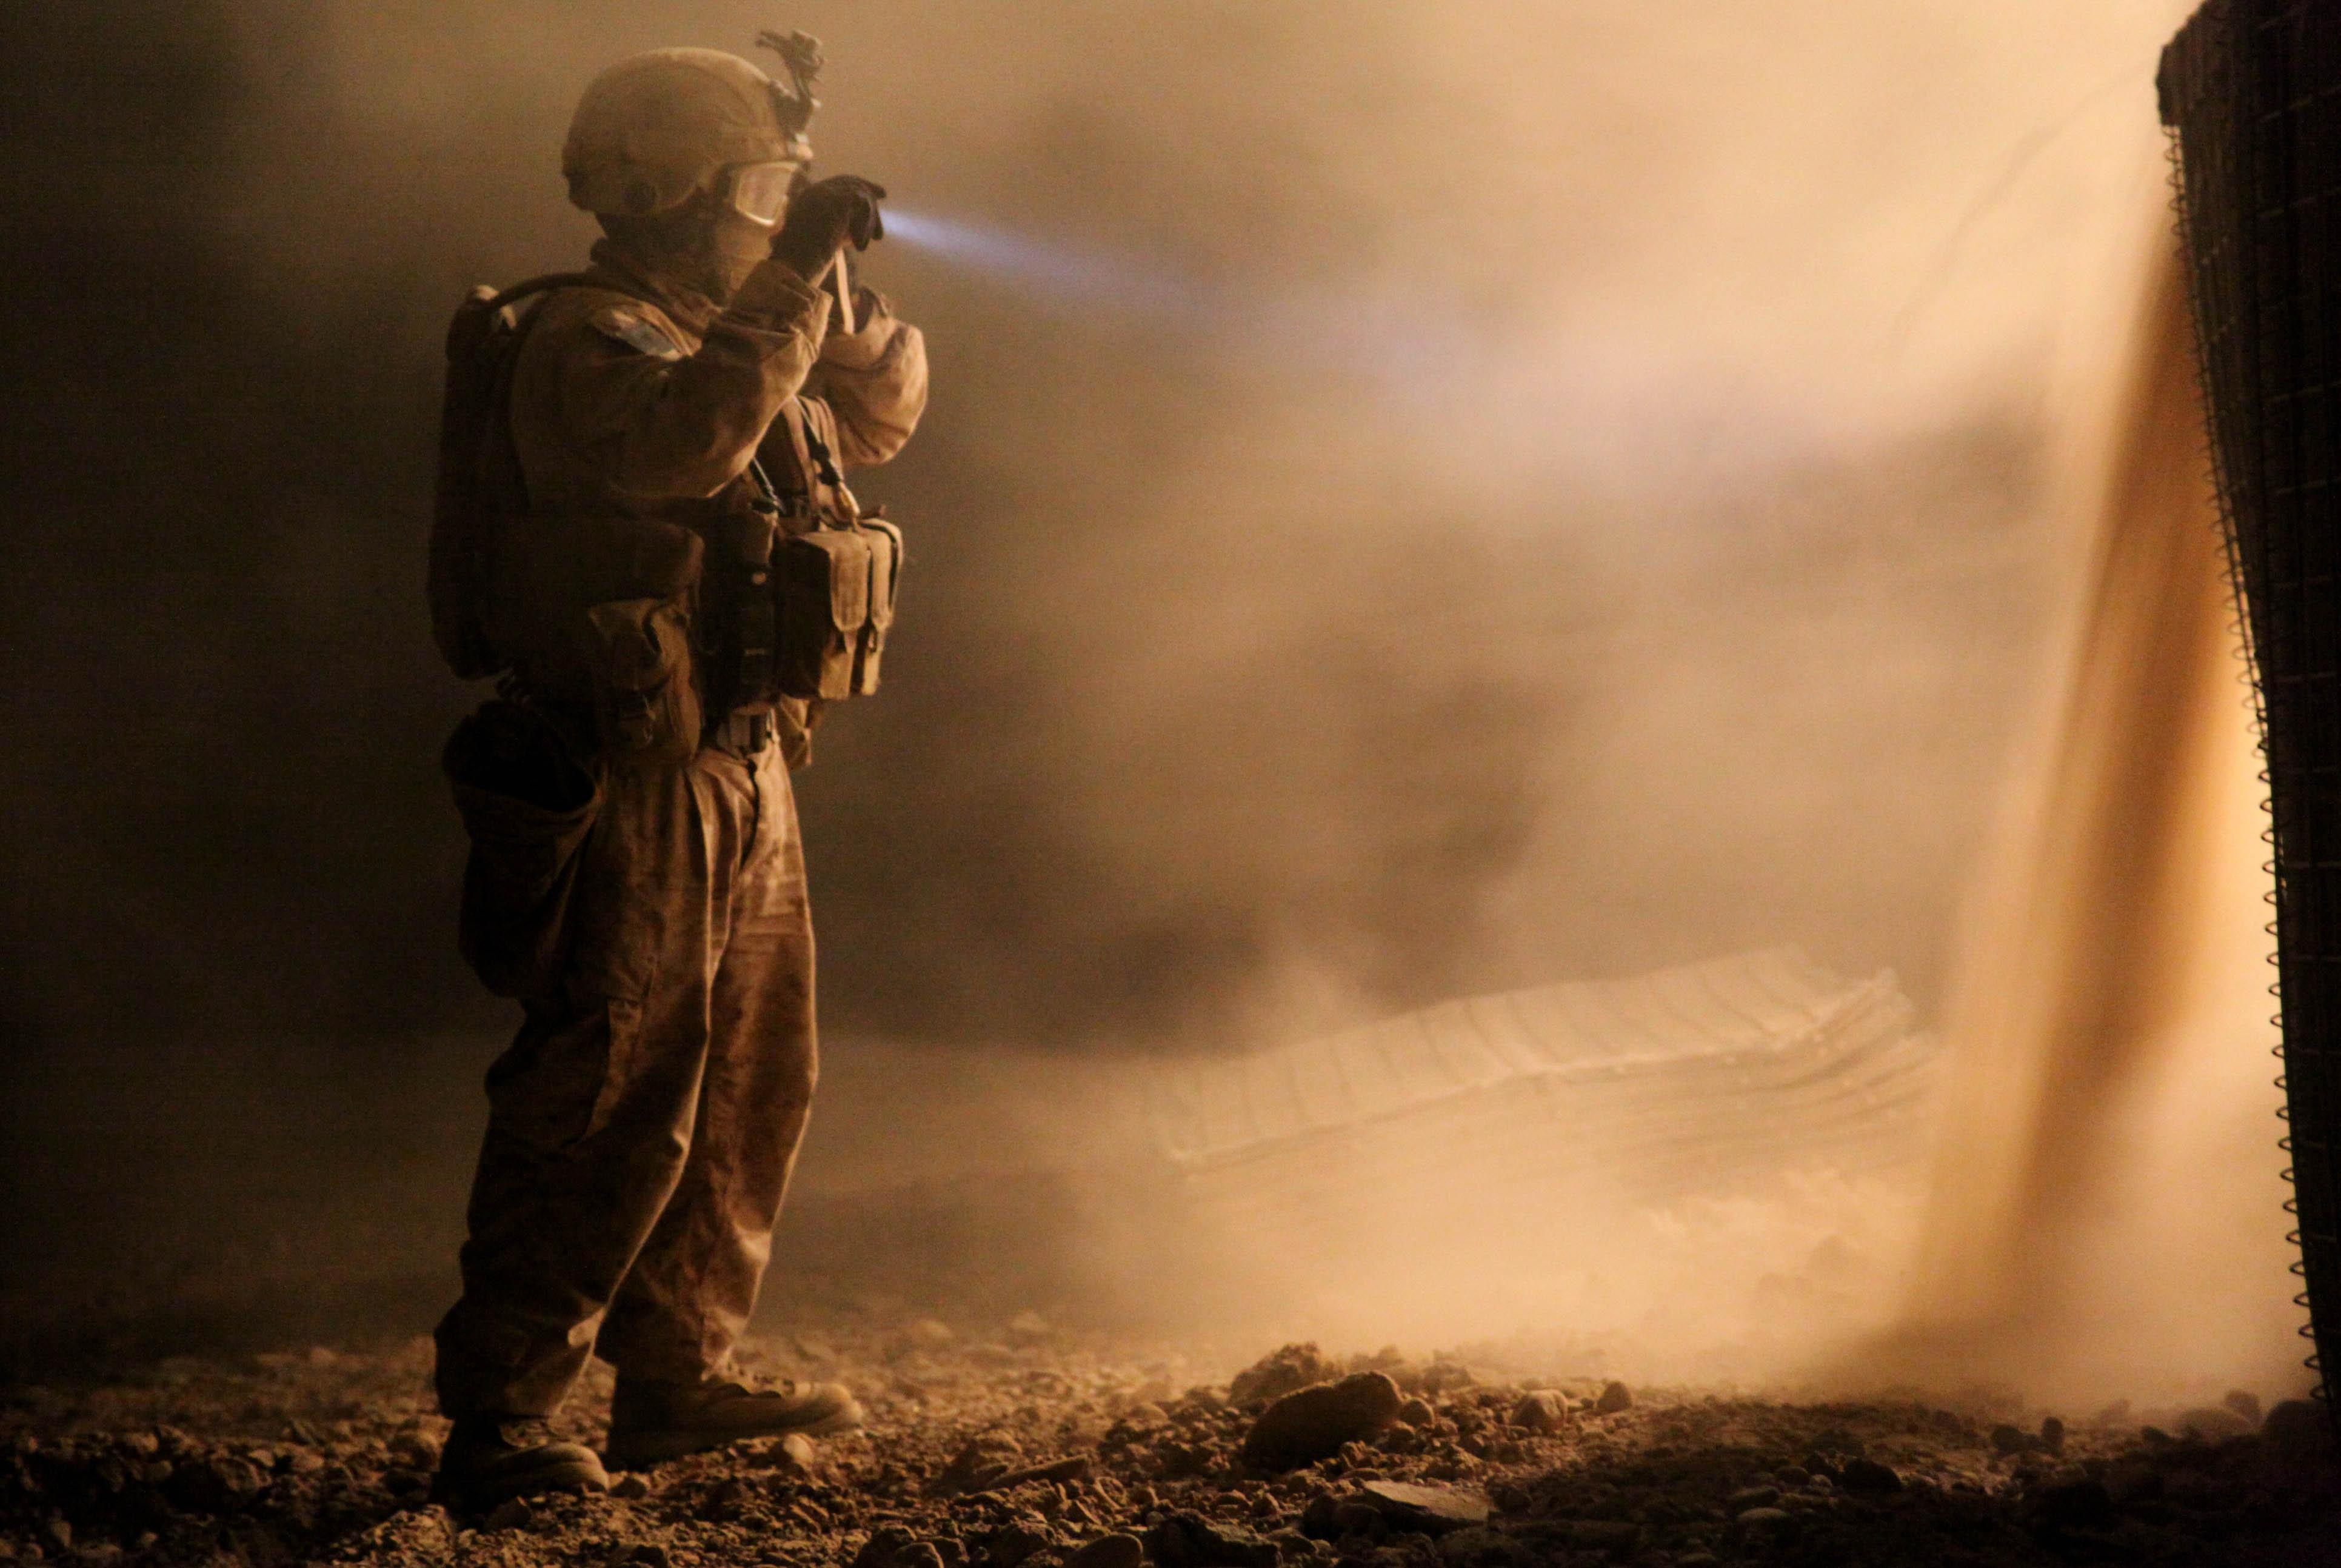 File:Defense.gov News Photo 101113-M-5160M-639 - U.S. Marine Corps ...